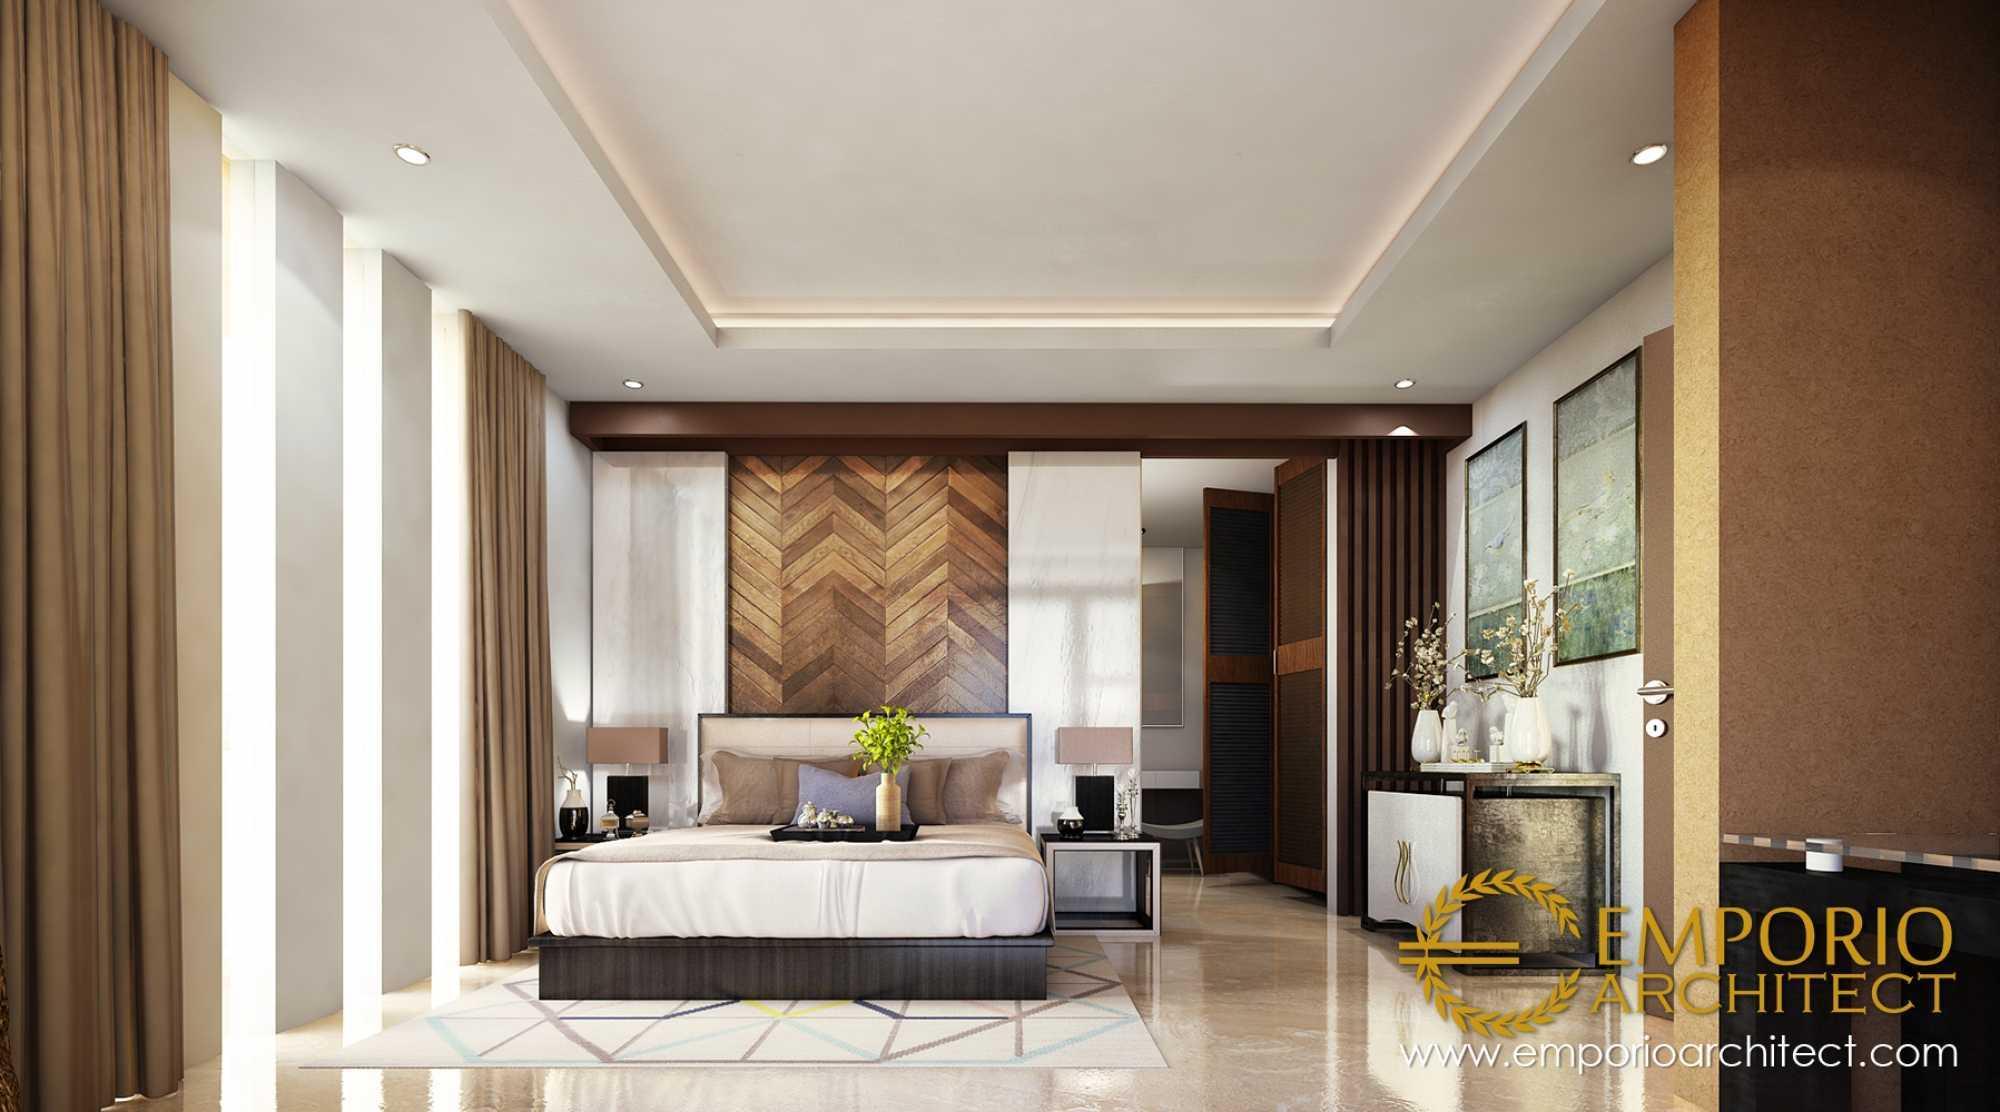 Emporio Architect Desain Rumah Modern Tropis 339  @ Lombok Pulau Lombok, Nusa Tenggara Bar., Indonesia Pulau Lombok, Nusa Tenggara Bar., Indonesia Emporio-Architect-Desain-Rumah-Modern-Tropis-339-Lombok  73347